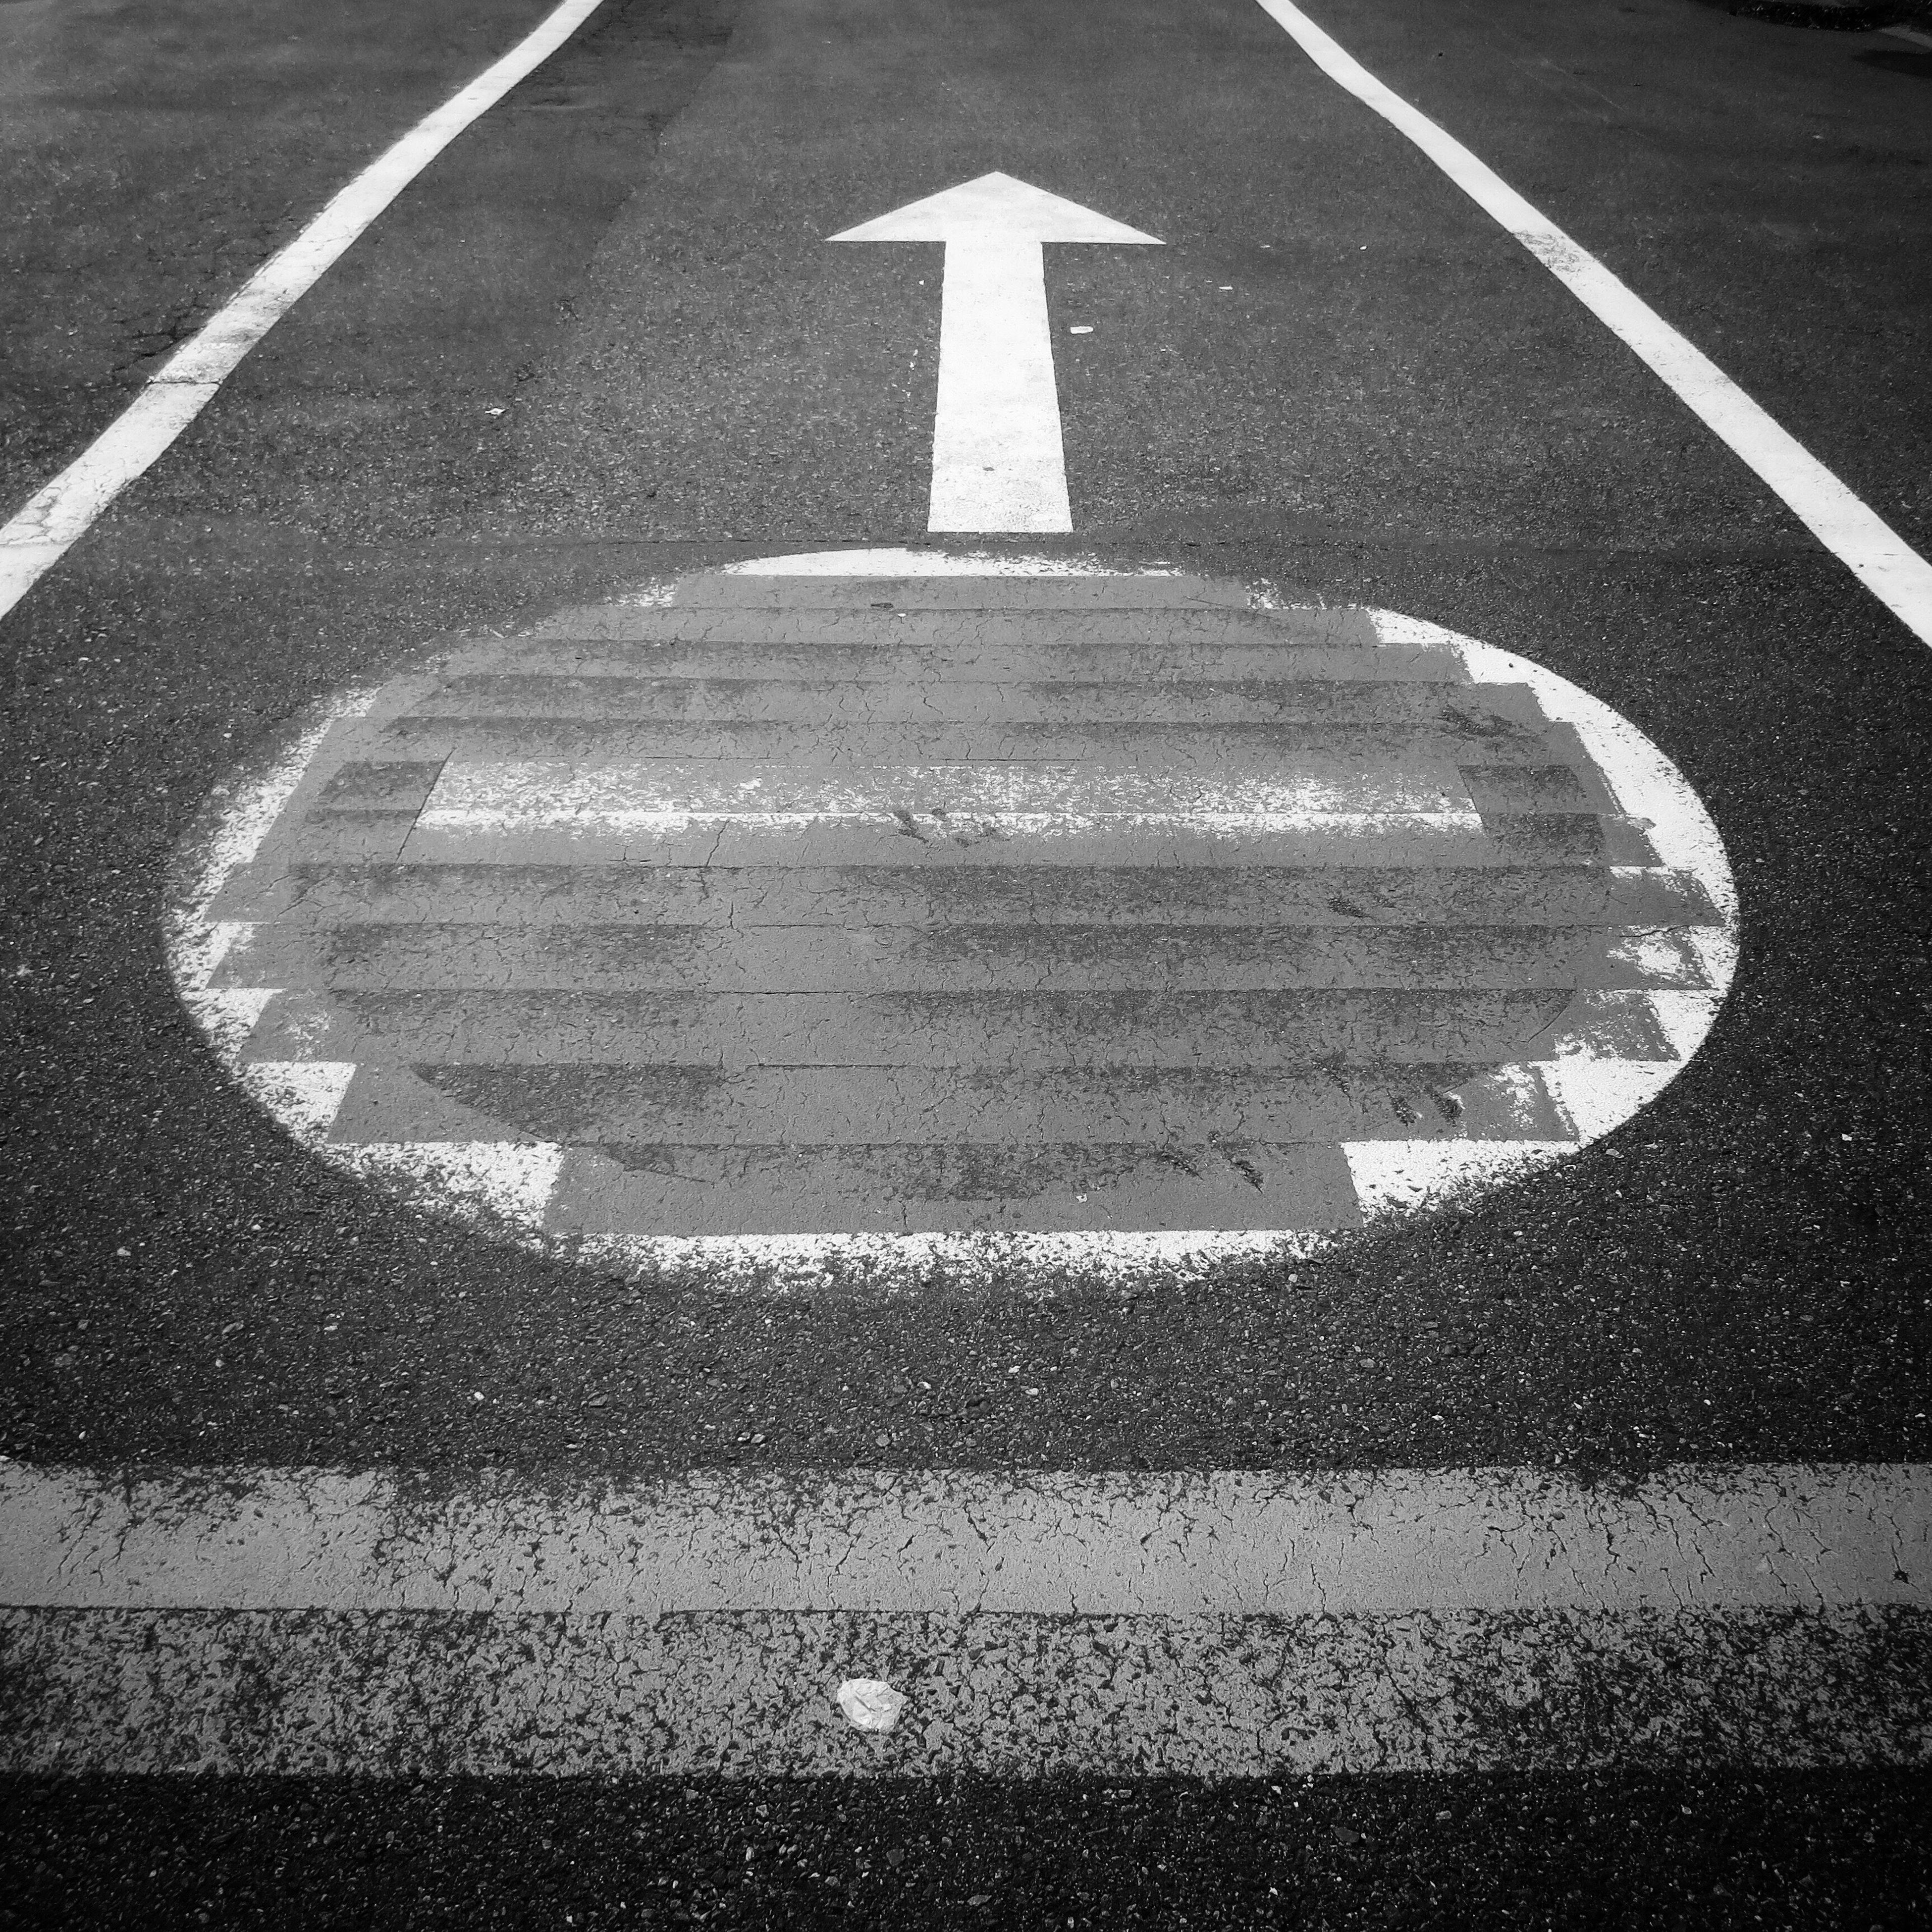 communication, road sign, no people, outdoors, transportation, road, day, asphalt, close-up